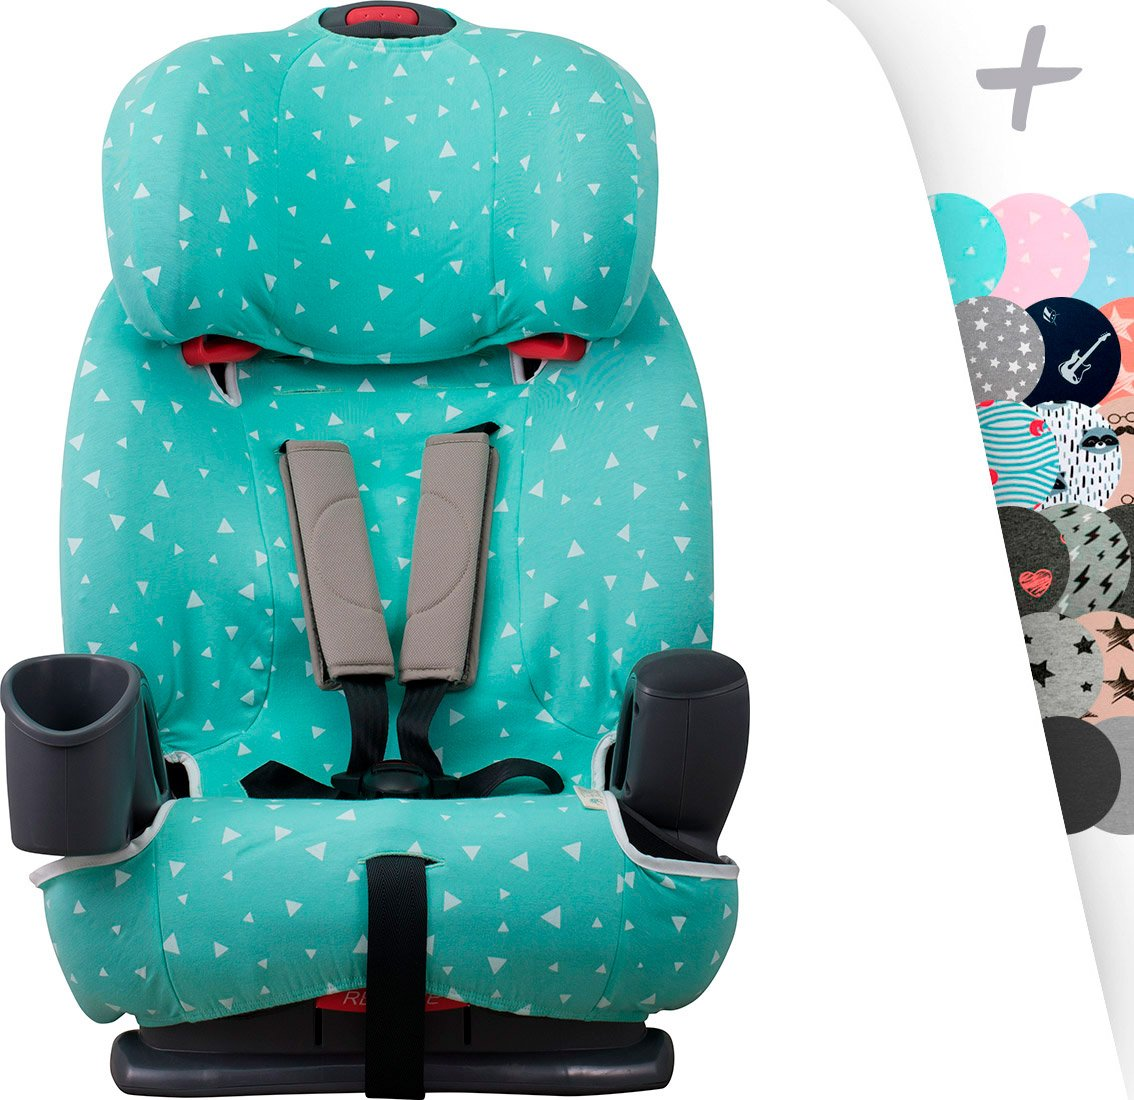 Surprising Janabebe Foam Cover Liner For Graco Nautilus Mint Sparkles Uwap Interior Chair Design Uwaporg